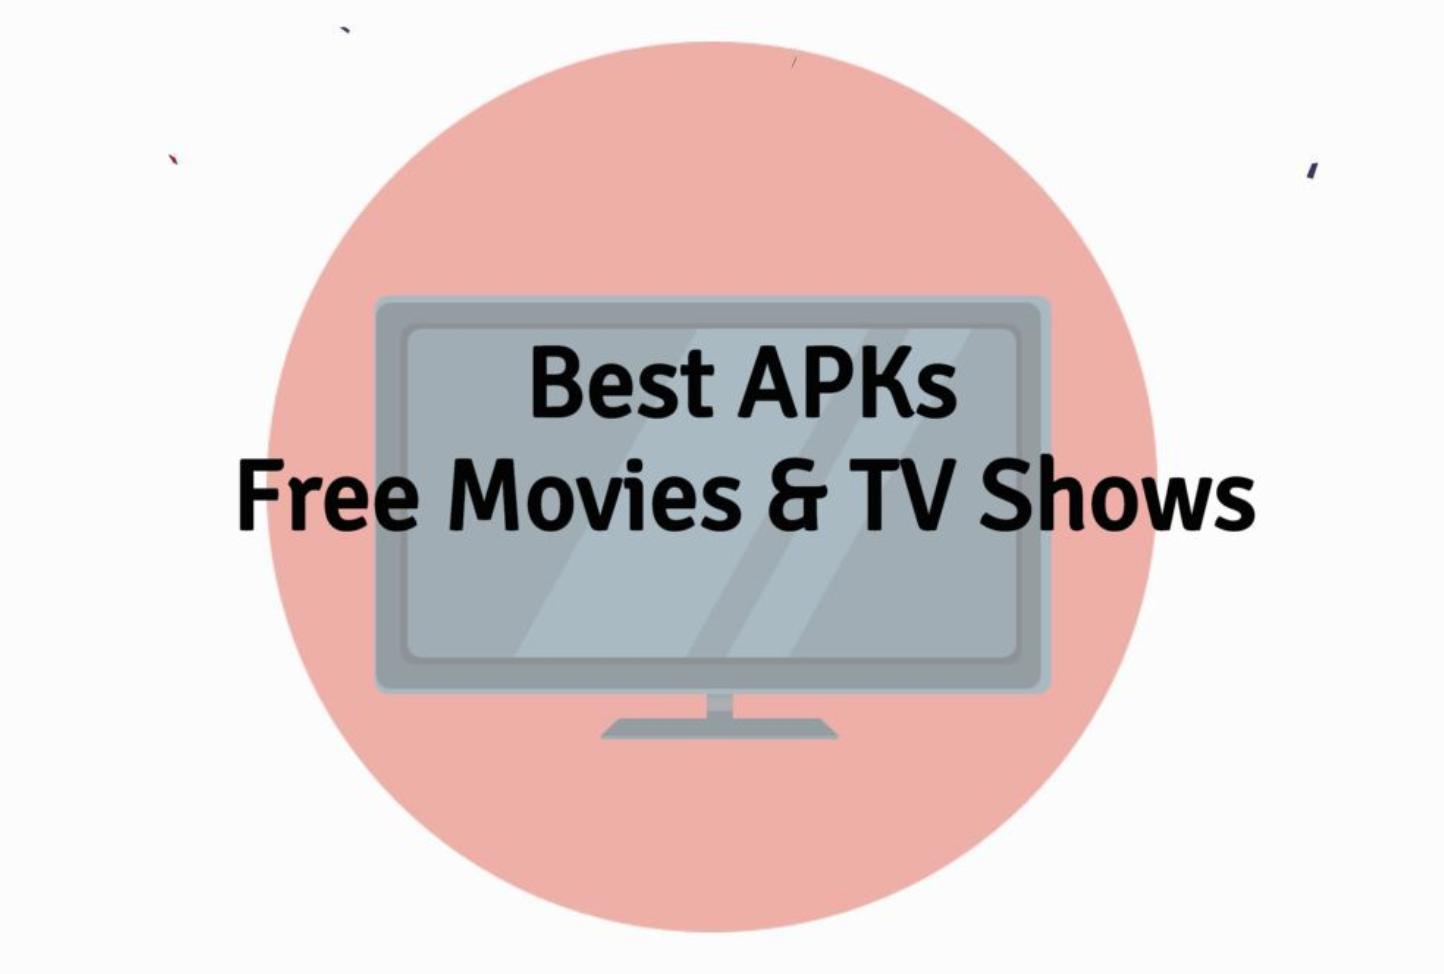 Best APKs